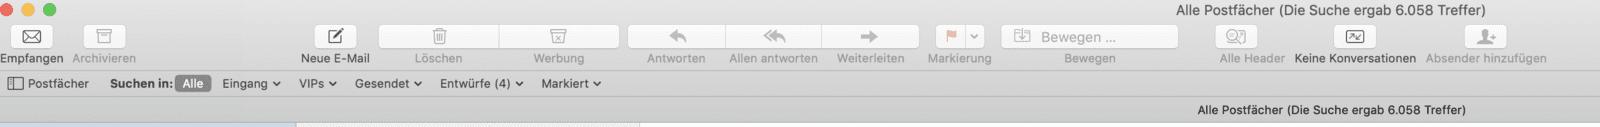 Suchen Apple.Mail.png